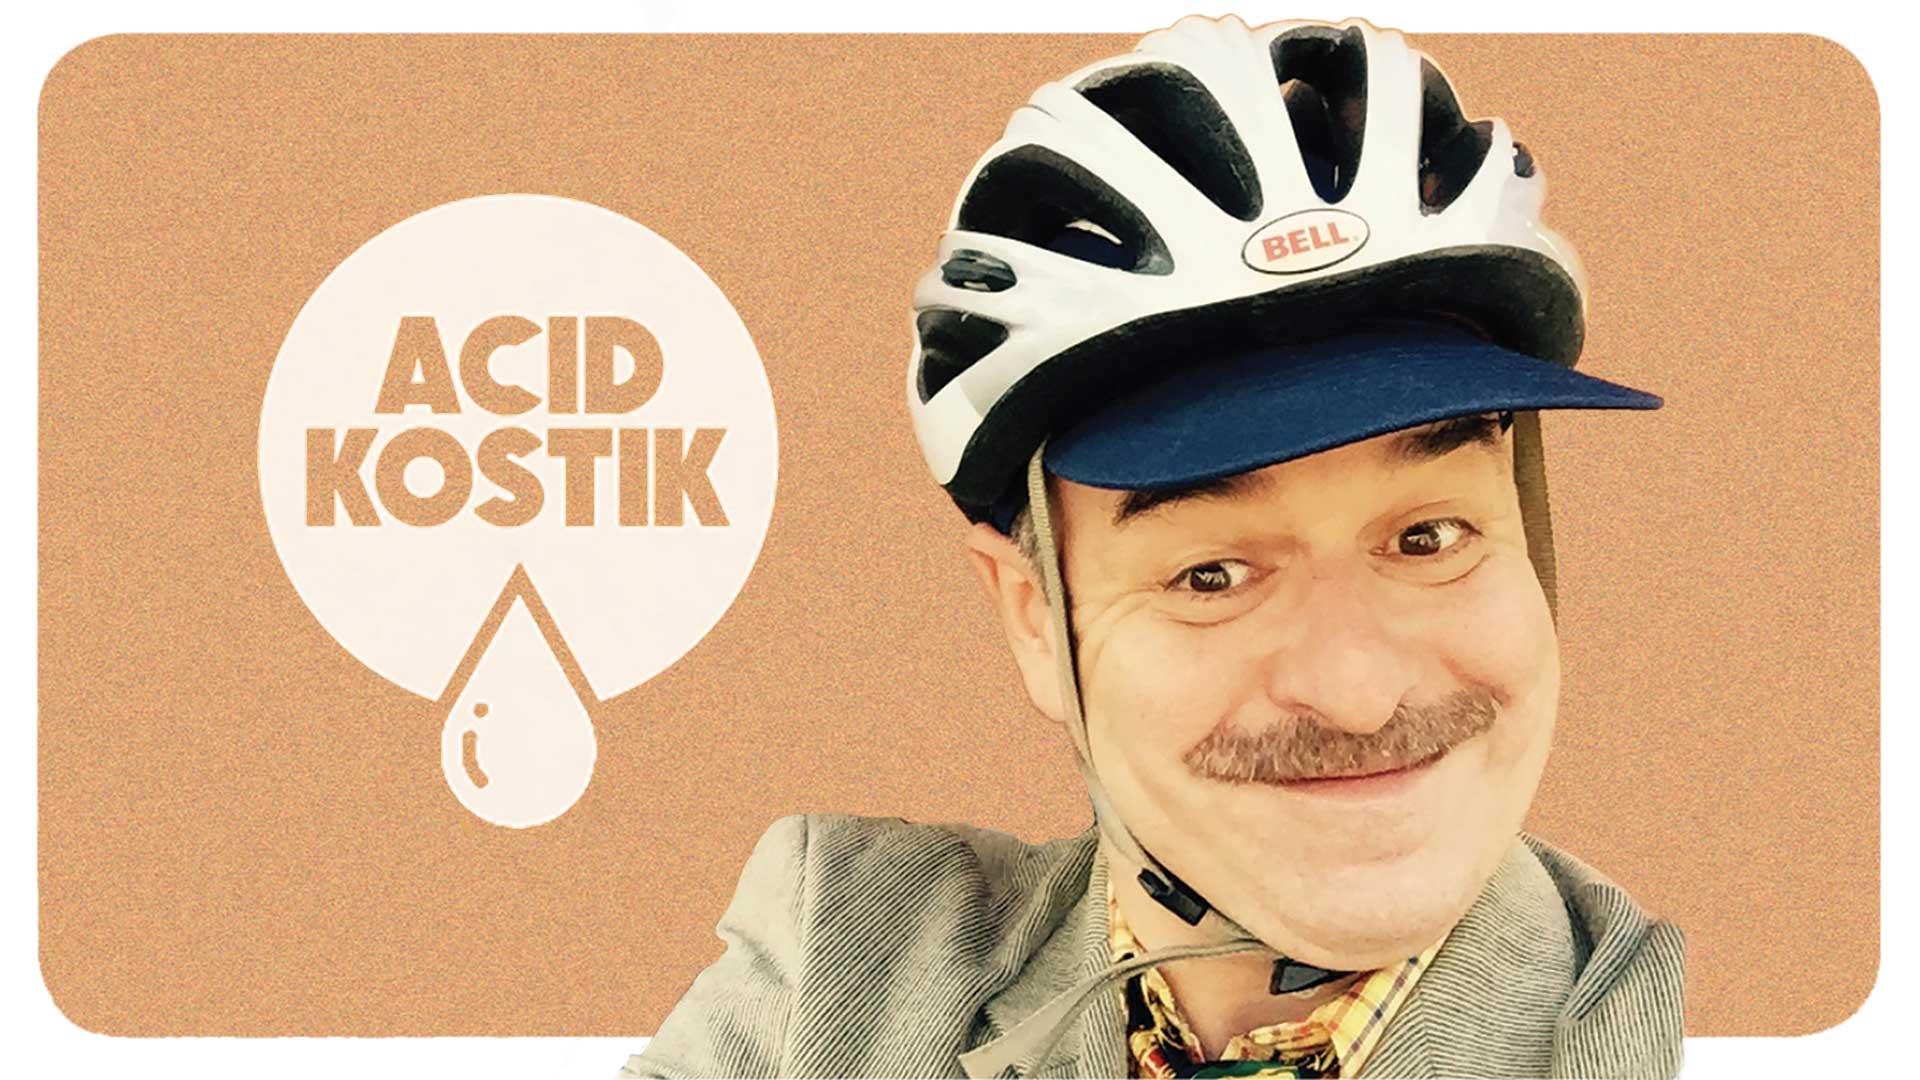 acid kostik